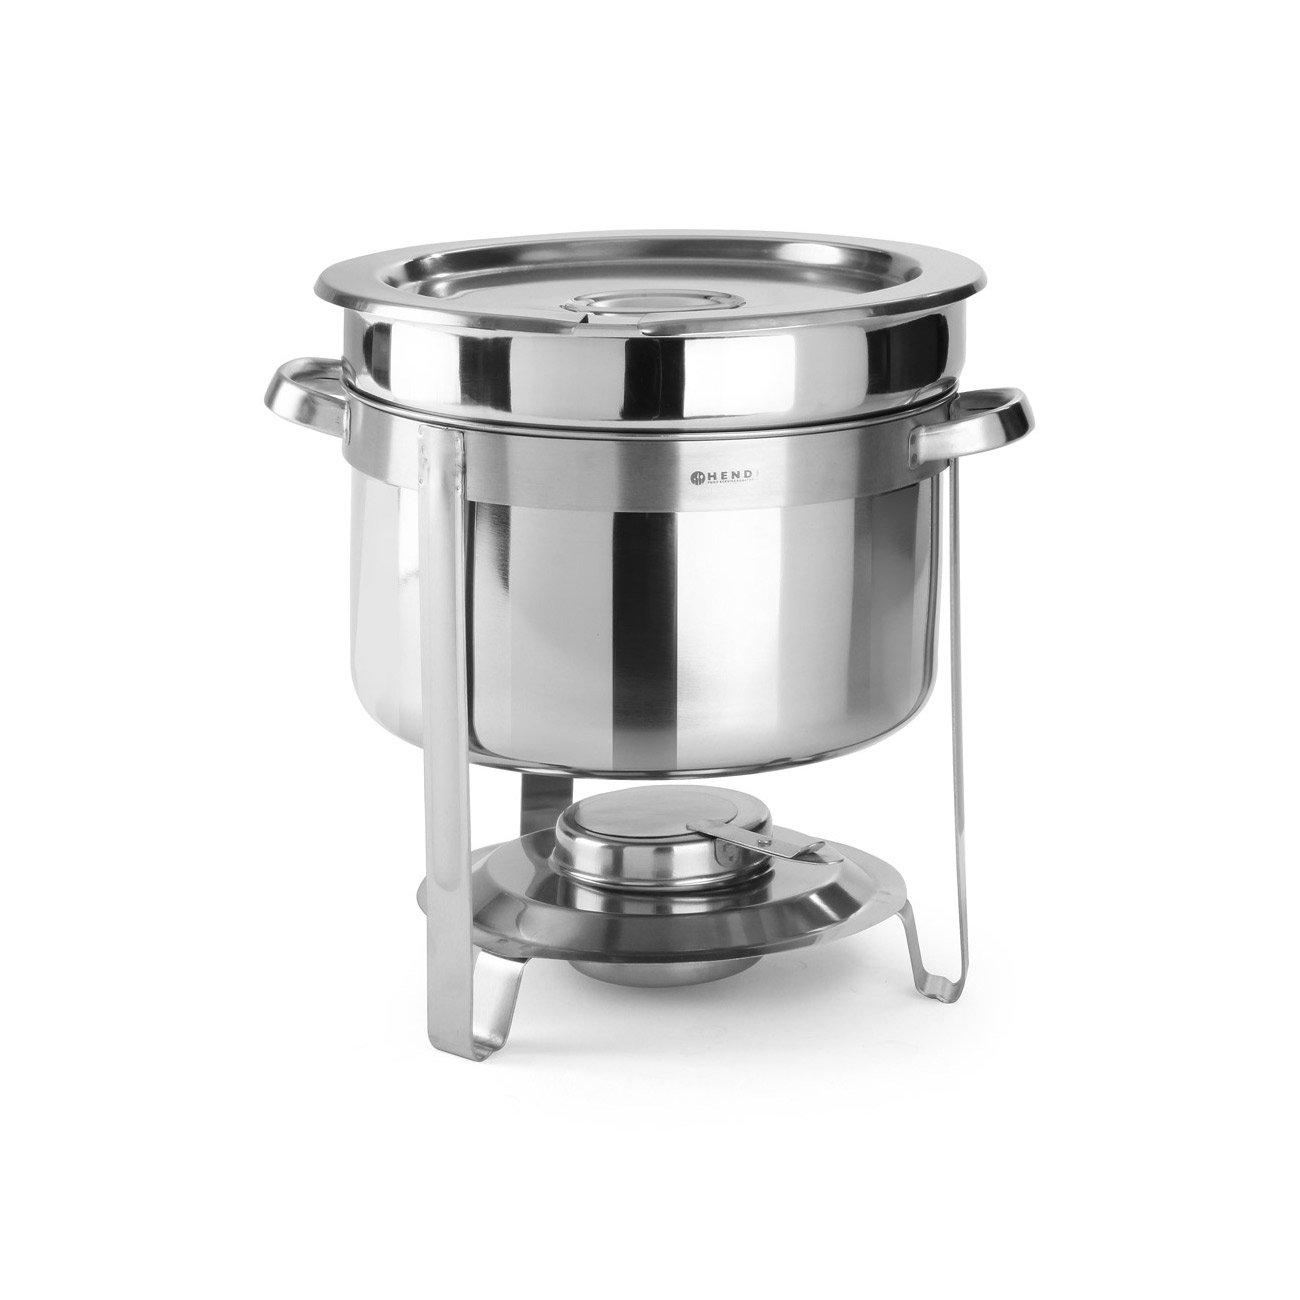 Hendi Suppen Chafing Dish - 472507